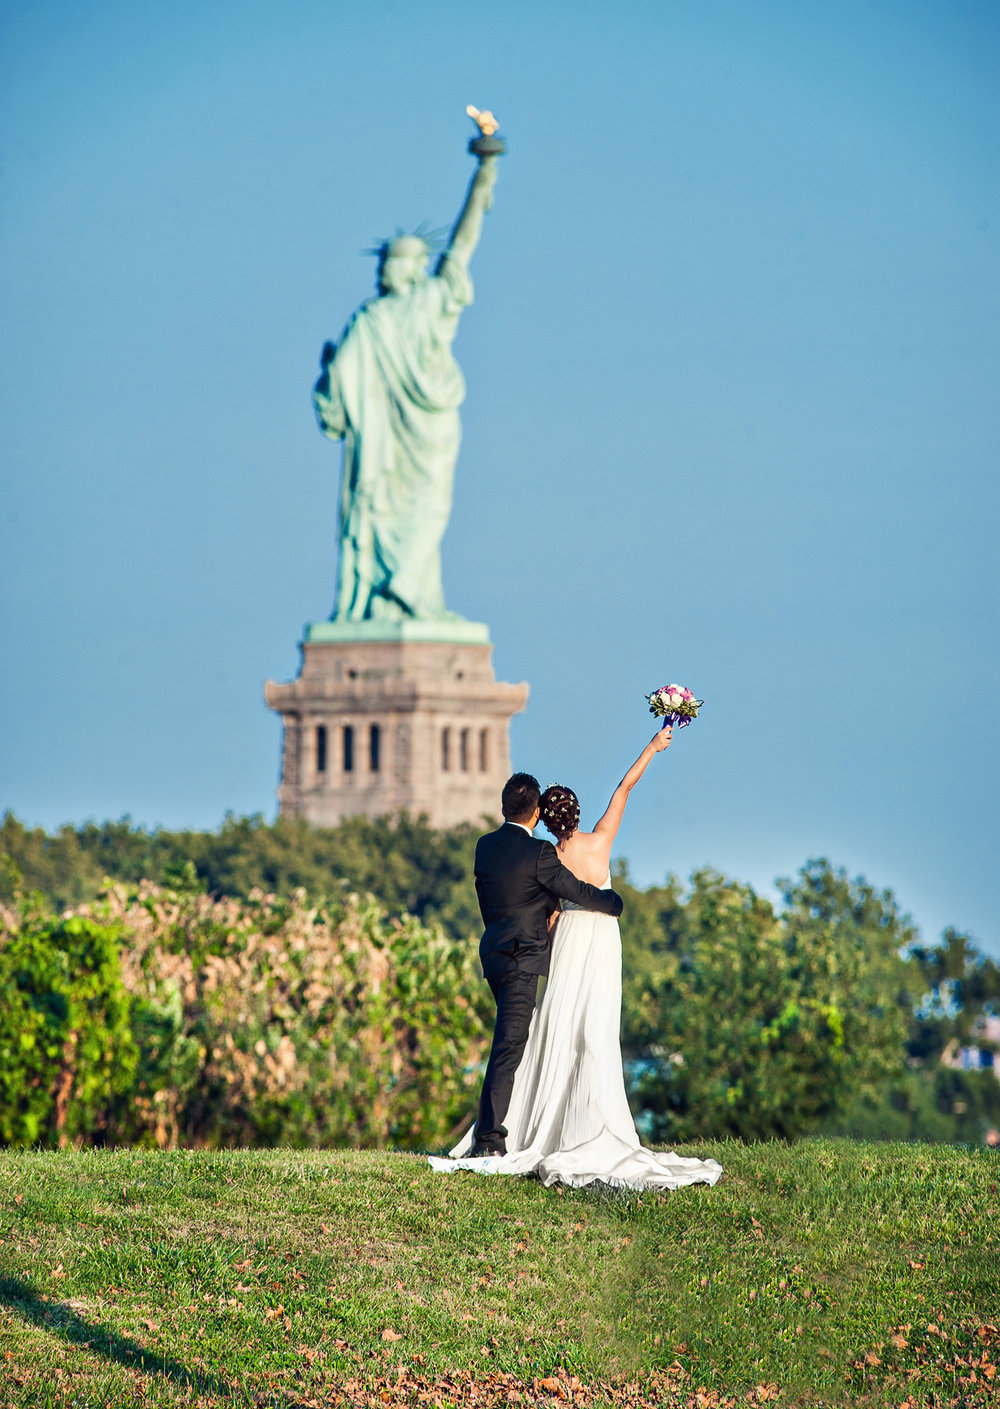 Chris_Hui_婚禮_婚紗照_pre_wedding_photography_best_004_statue_of_liberty_自由女神像.jpg